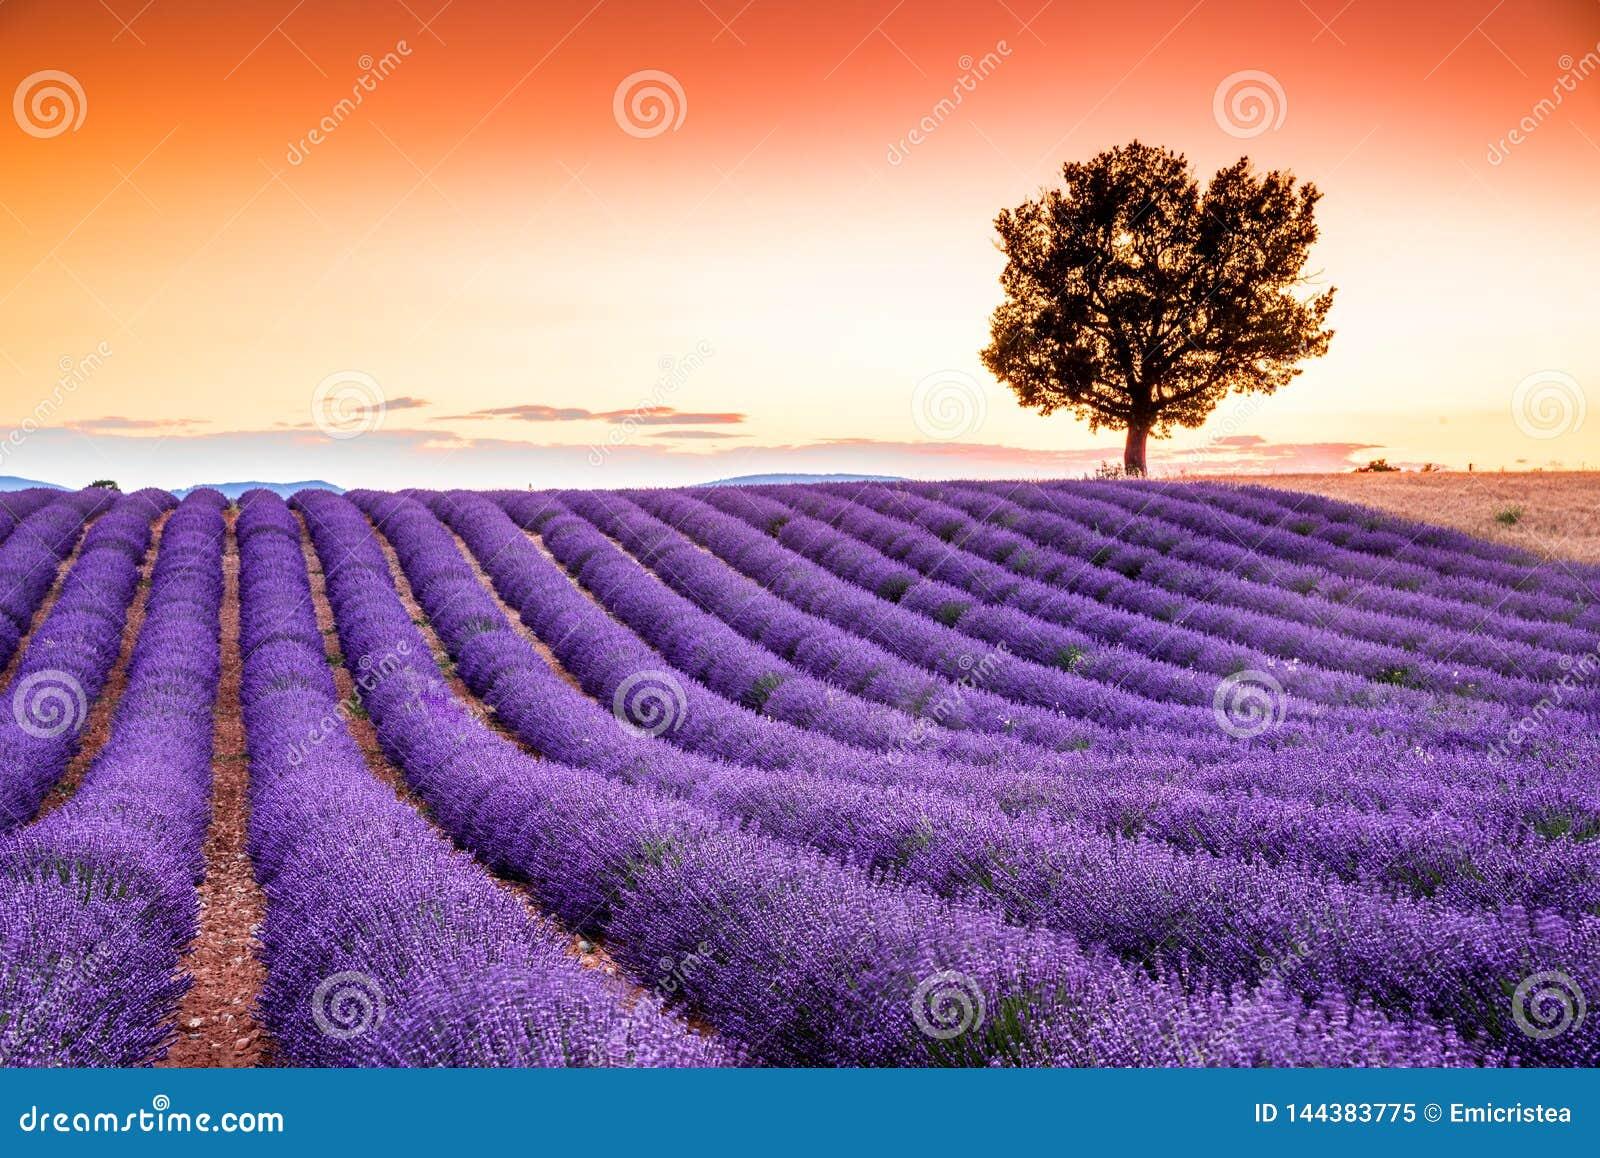 Valensole lavender in Provence, France